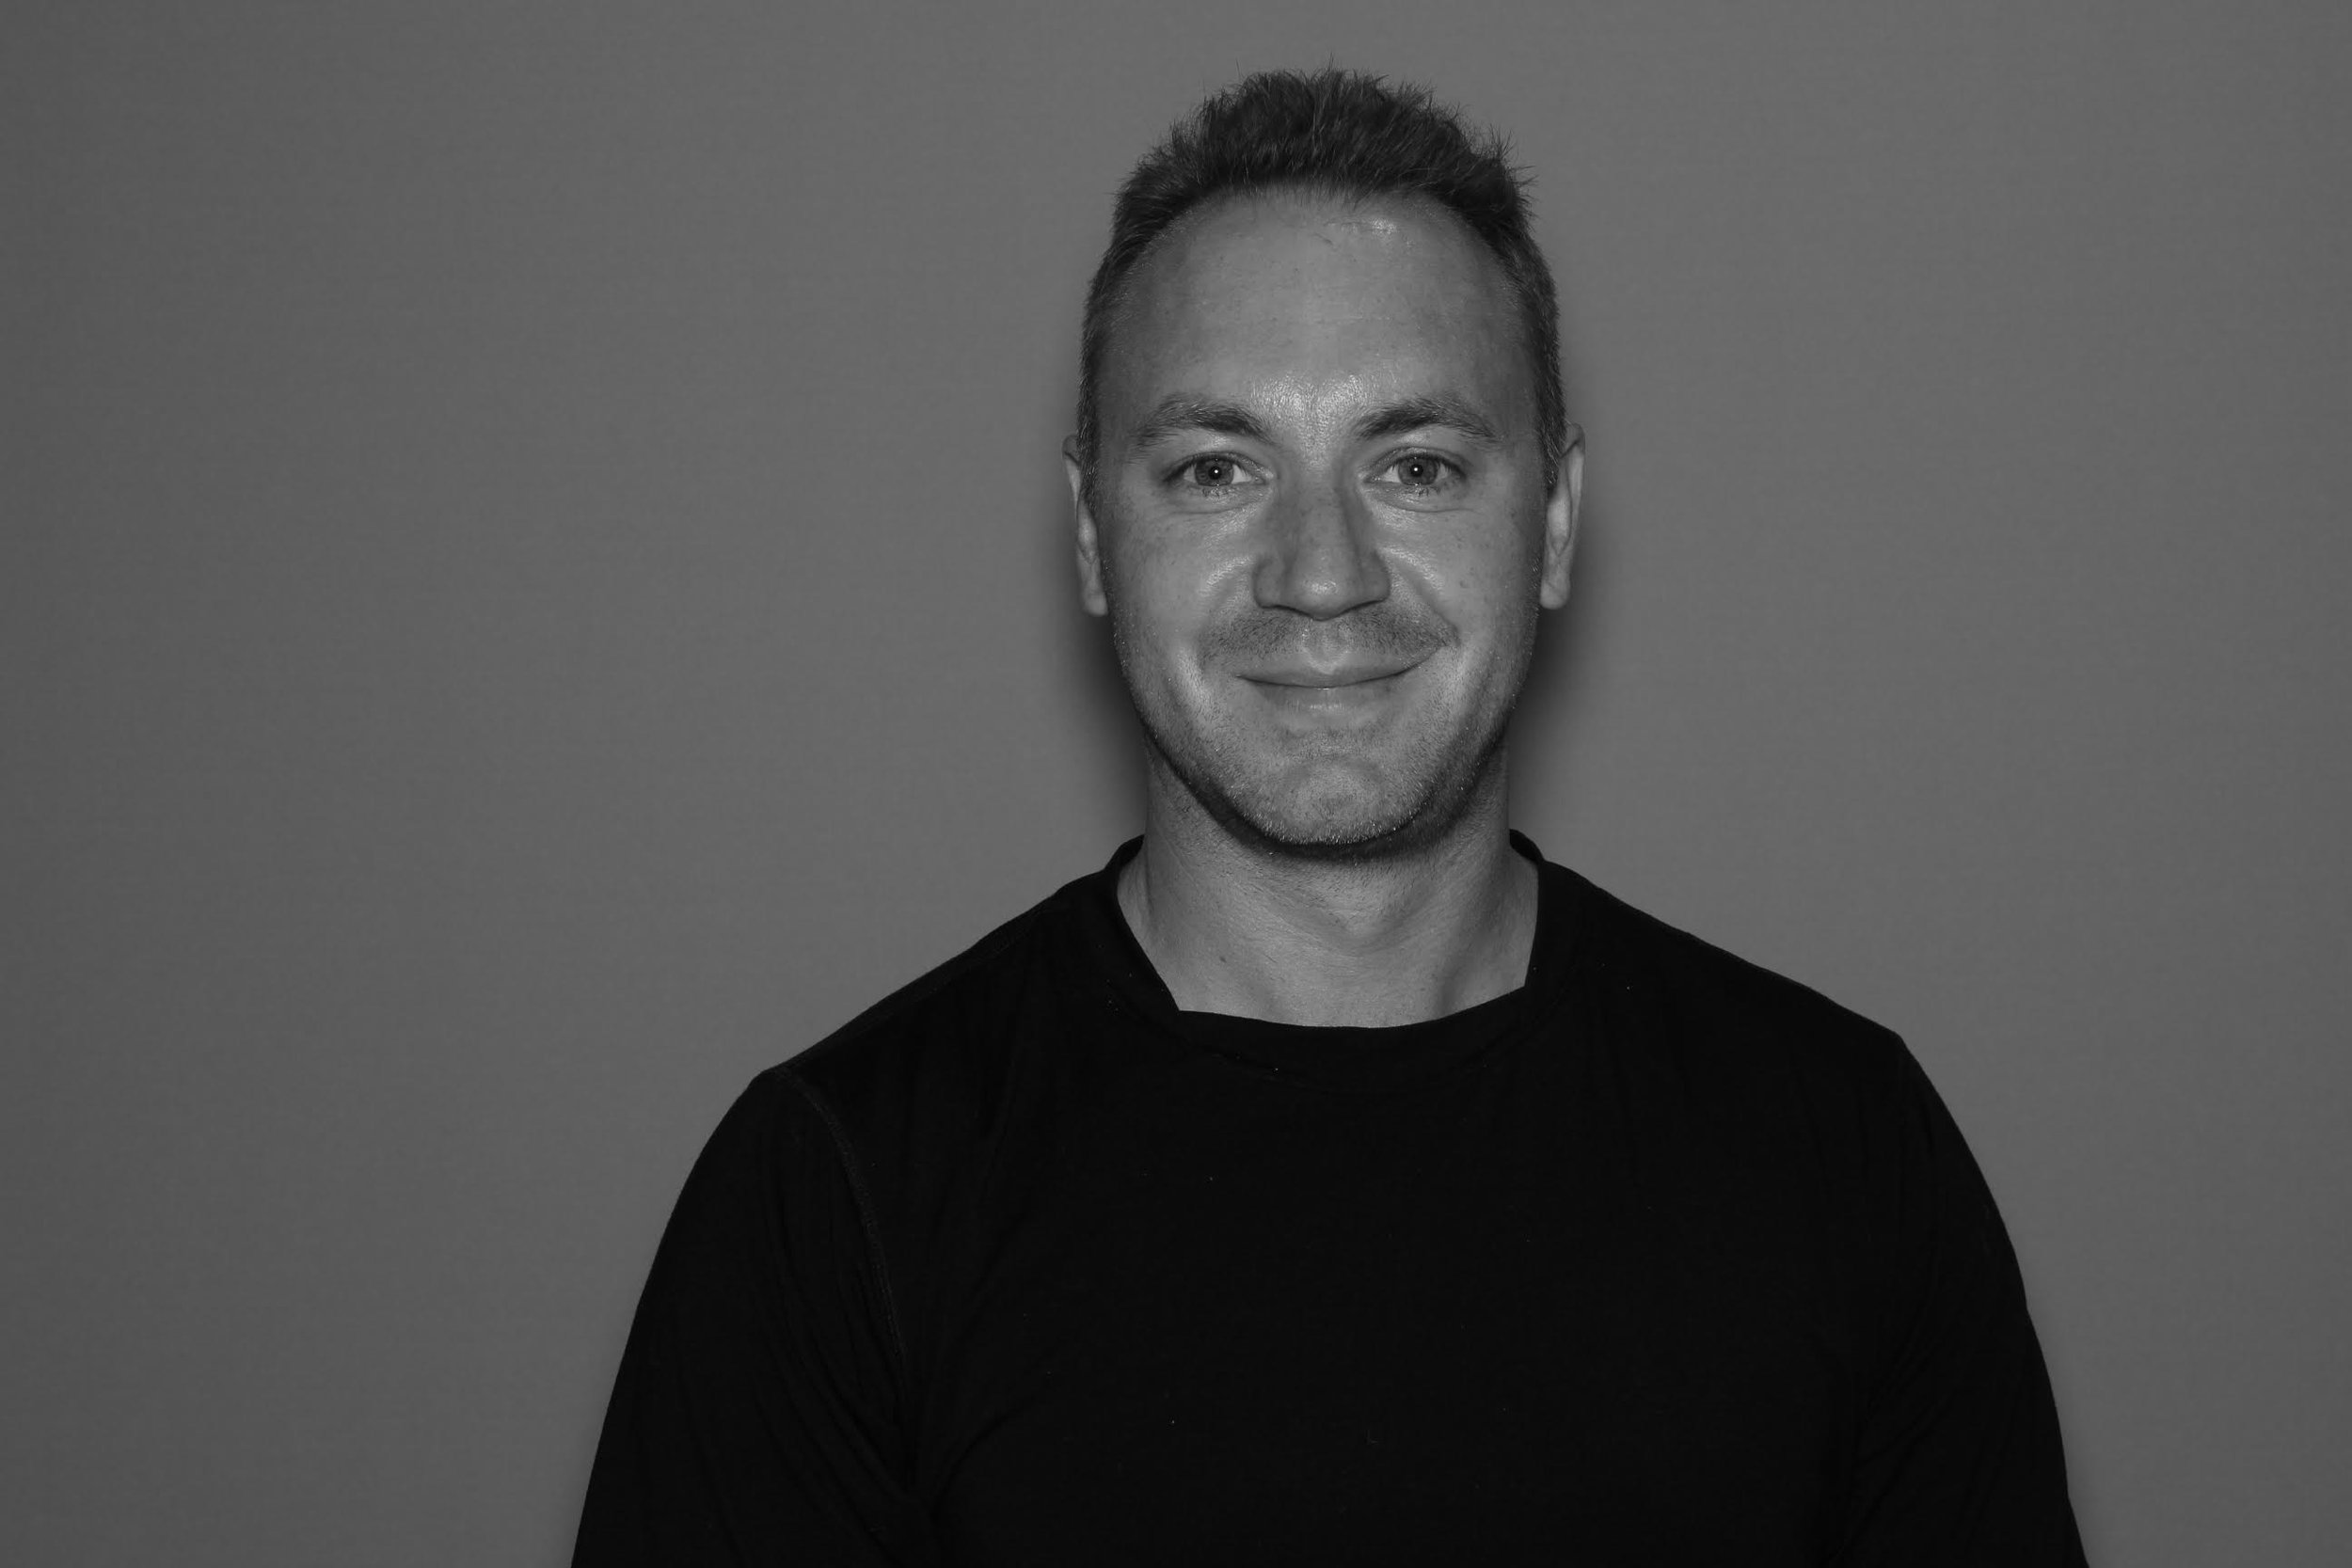 Johannes Waldstein, Co-Founder of FanAI (Photo: FanAI)